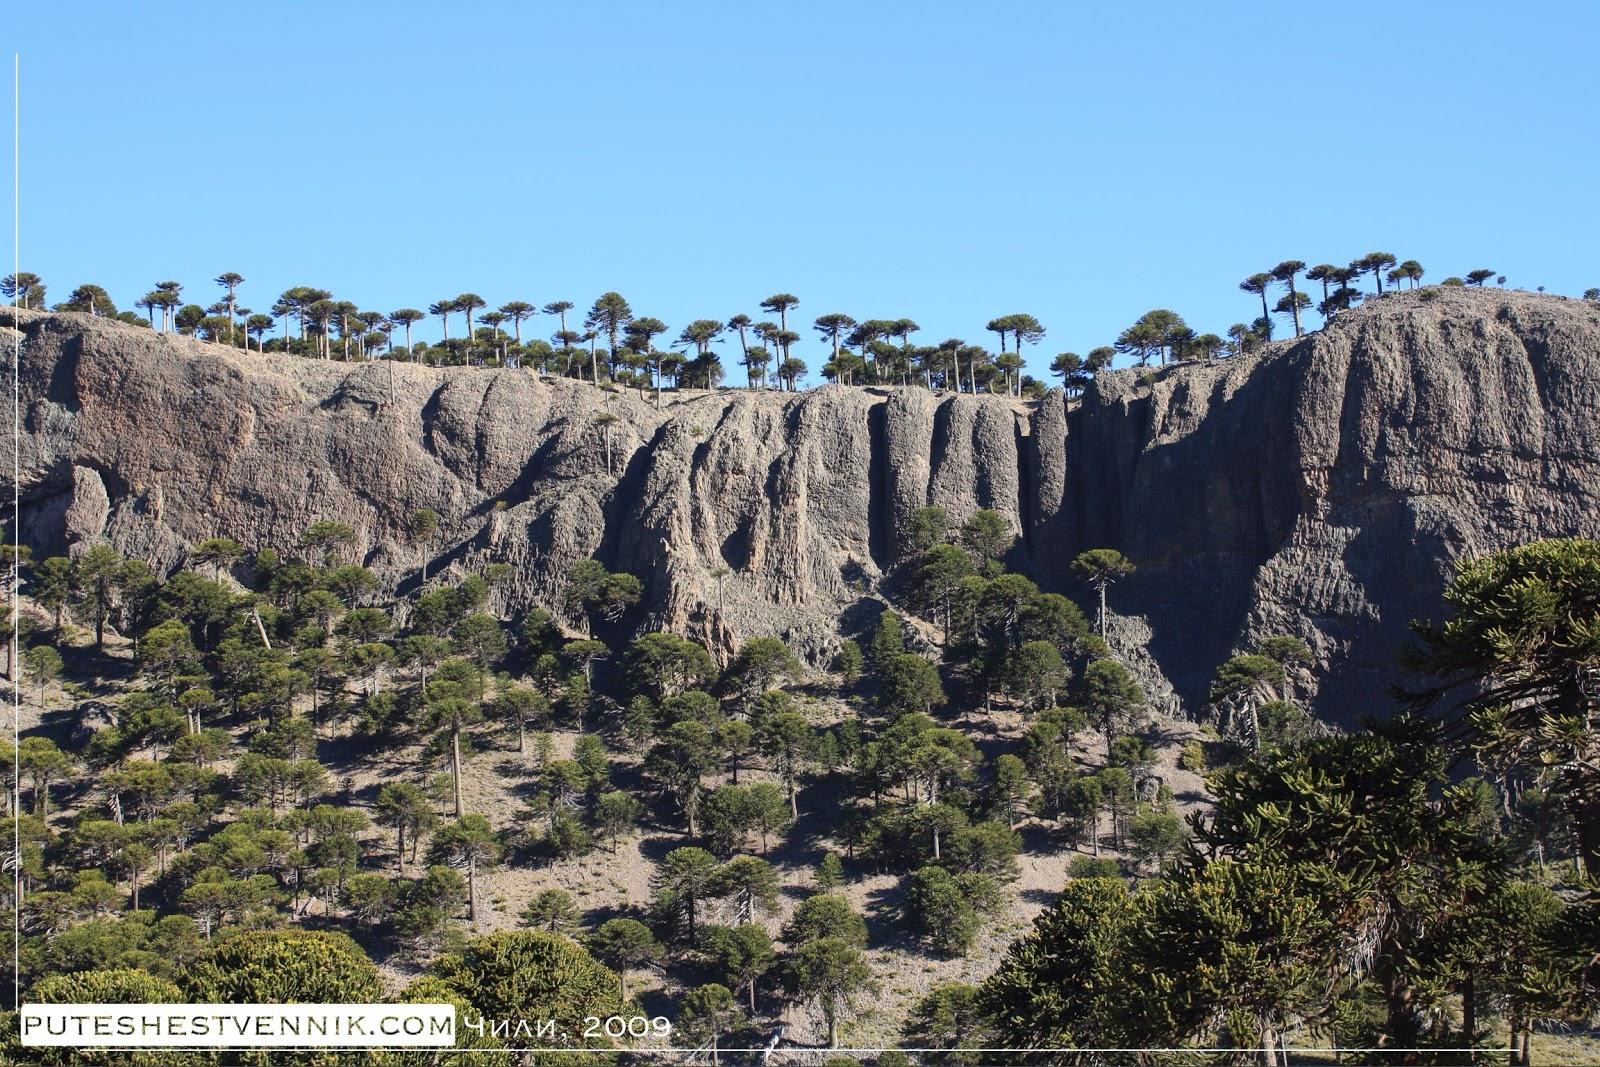 Араукарии и скалы в Чили